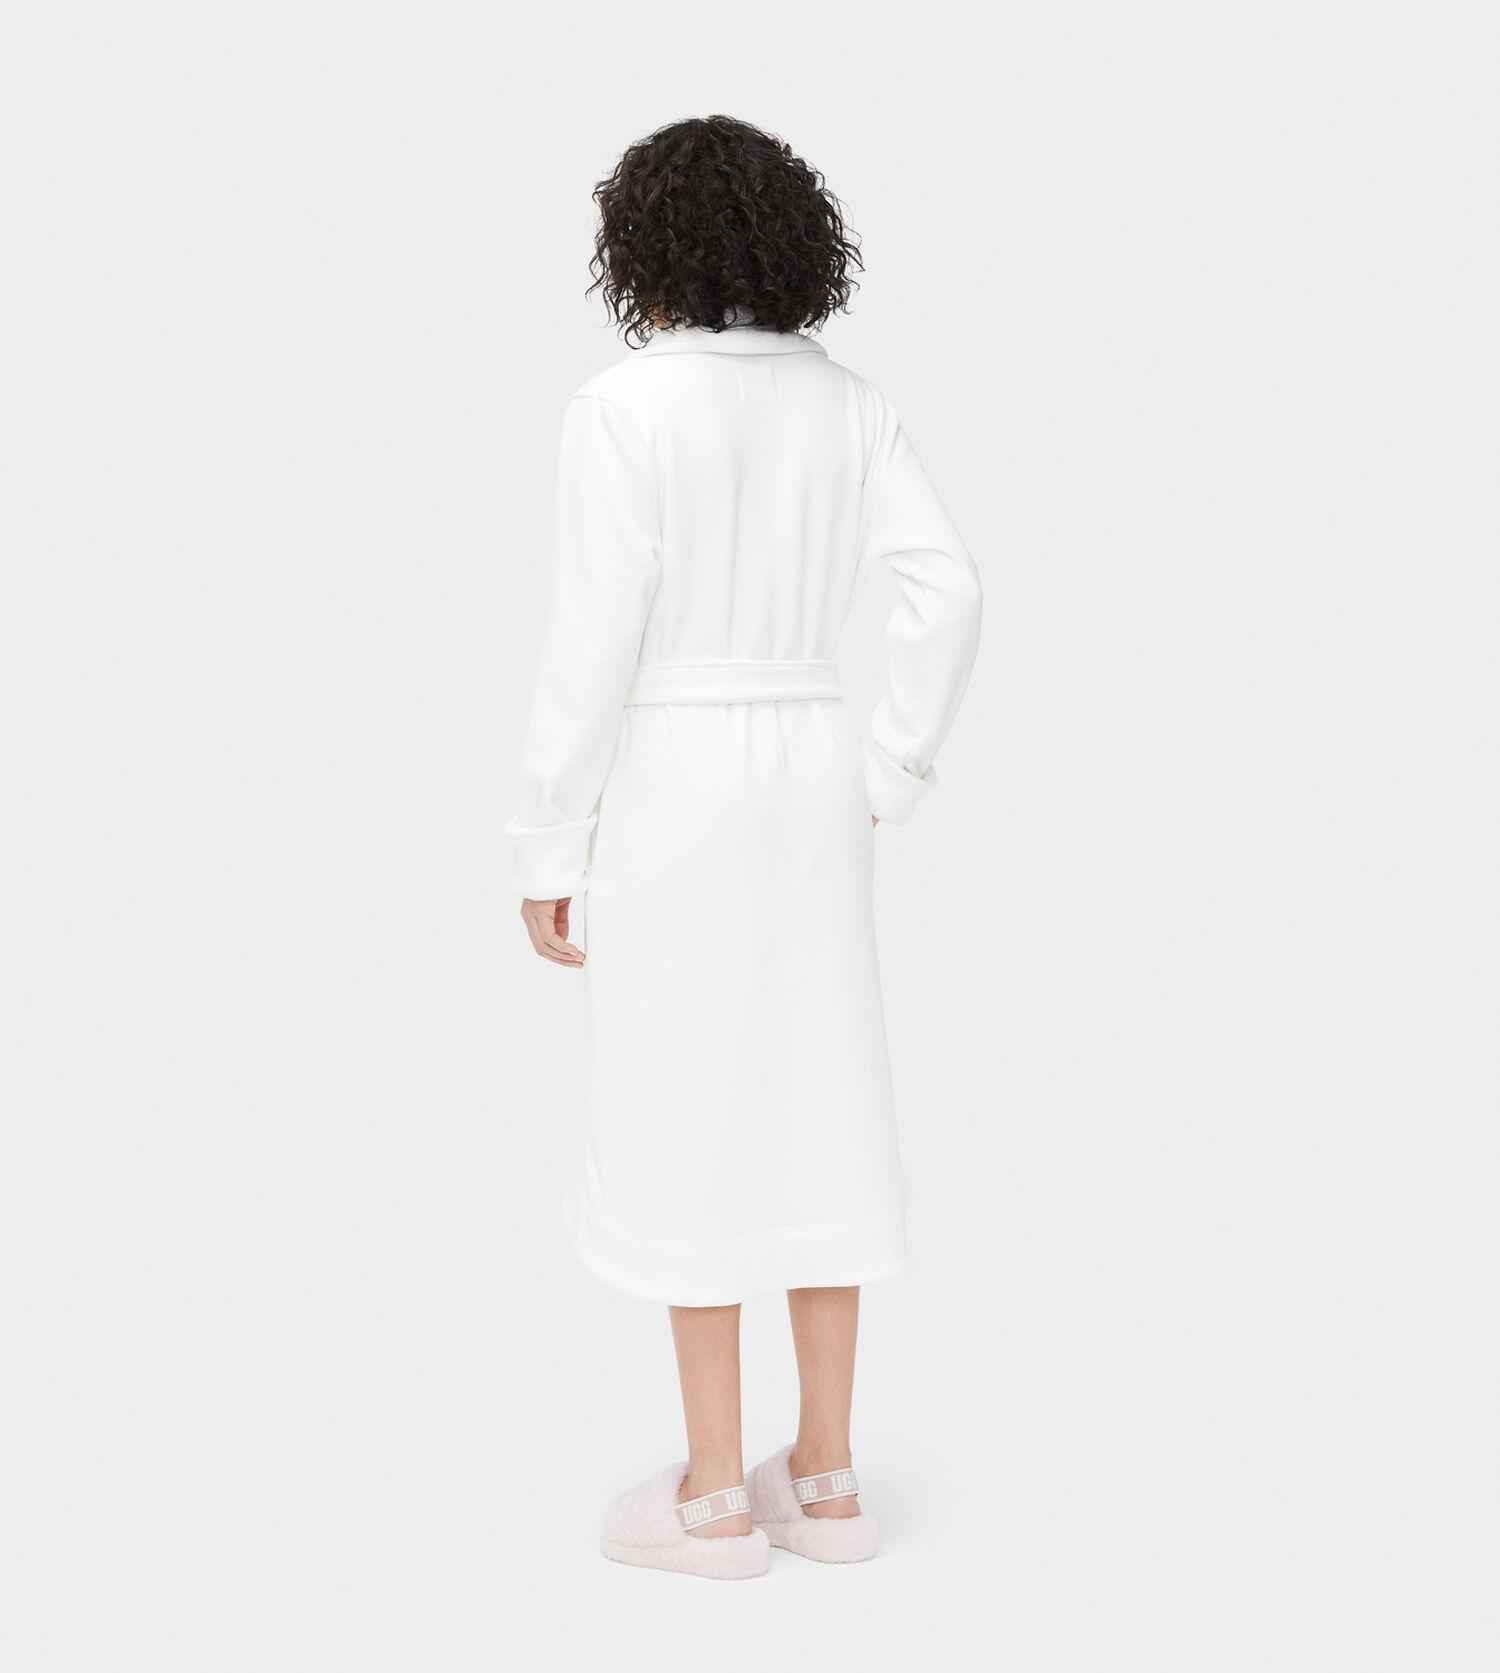 9d95b22cbc Zoom Duffield II Robe - Image 2 of 5